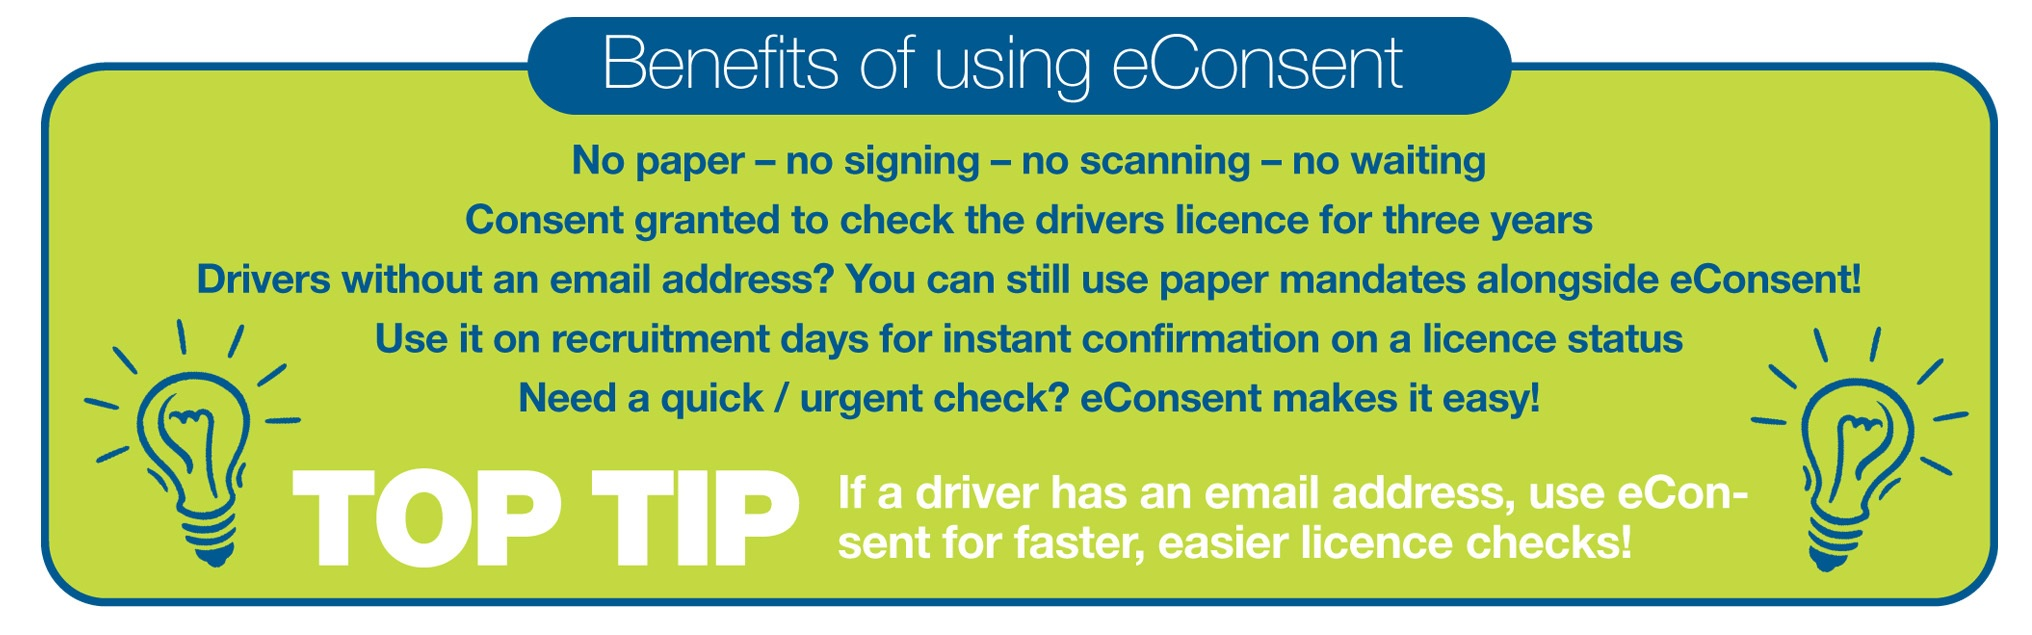 eConsent Benefits Image